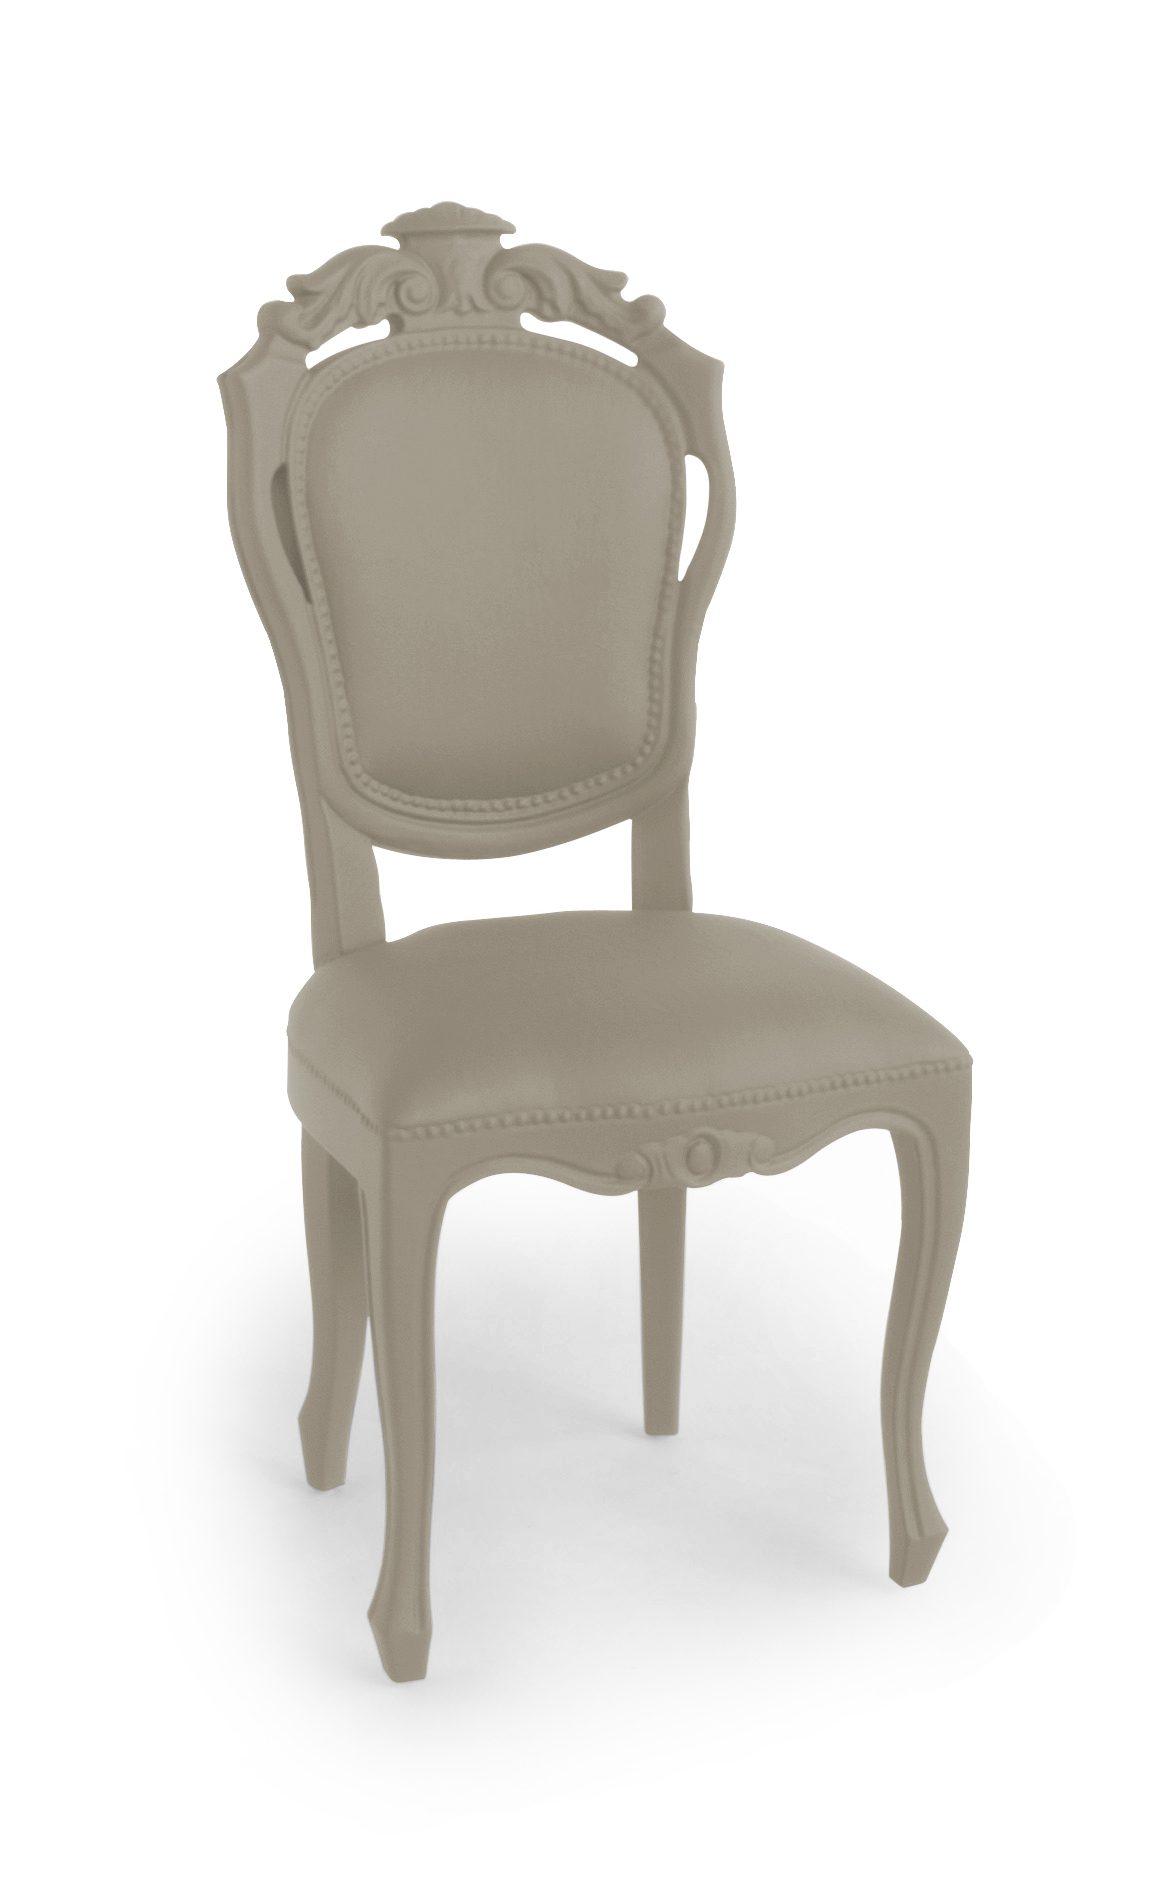 Plastic Fantastic Eettafelstoel Dining Chair Savannah Jspr Luxe